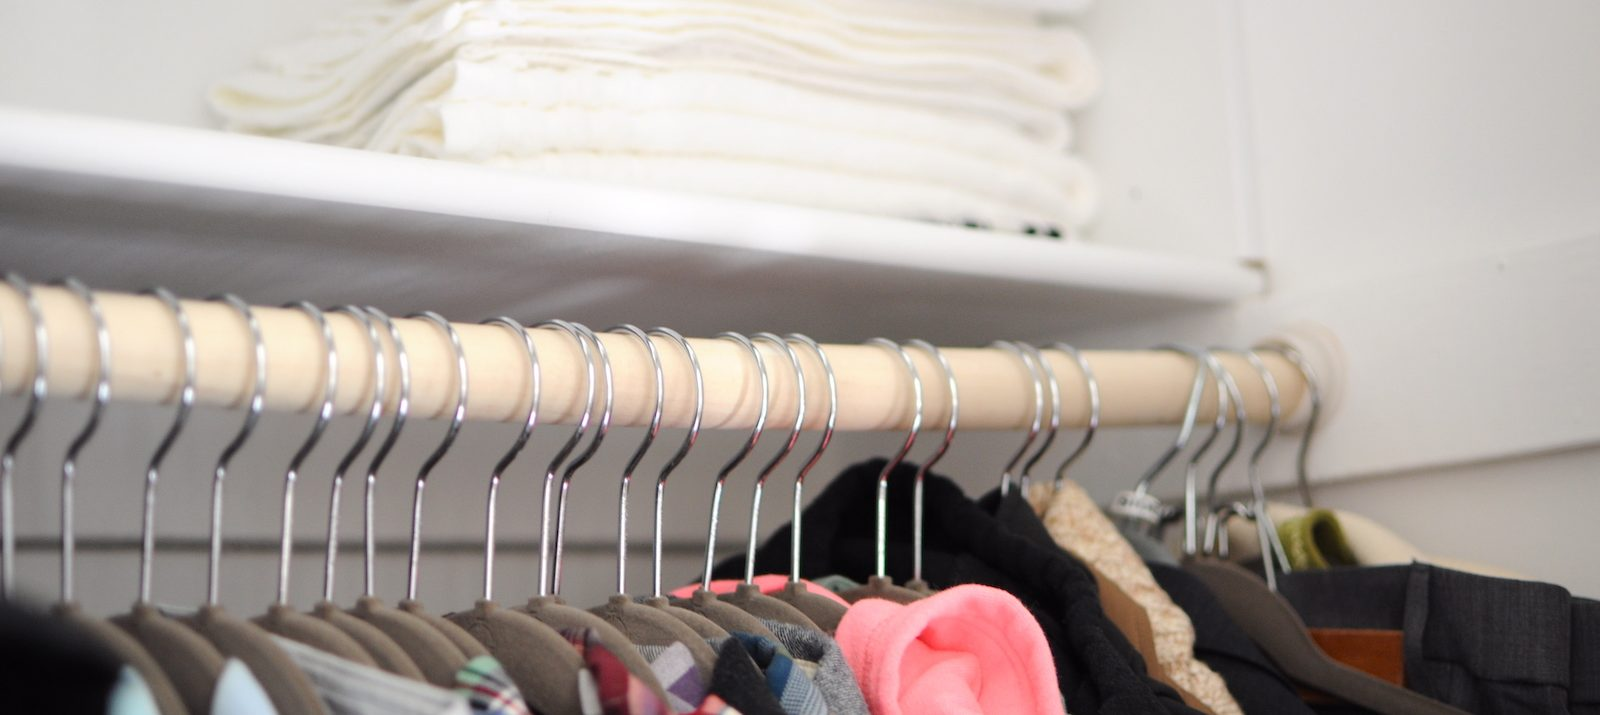 storage closet.jpg